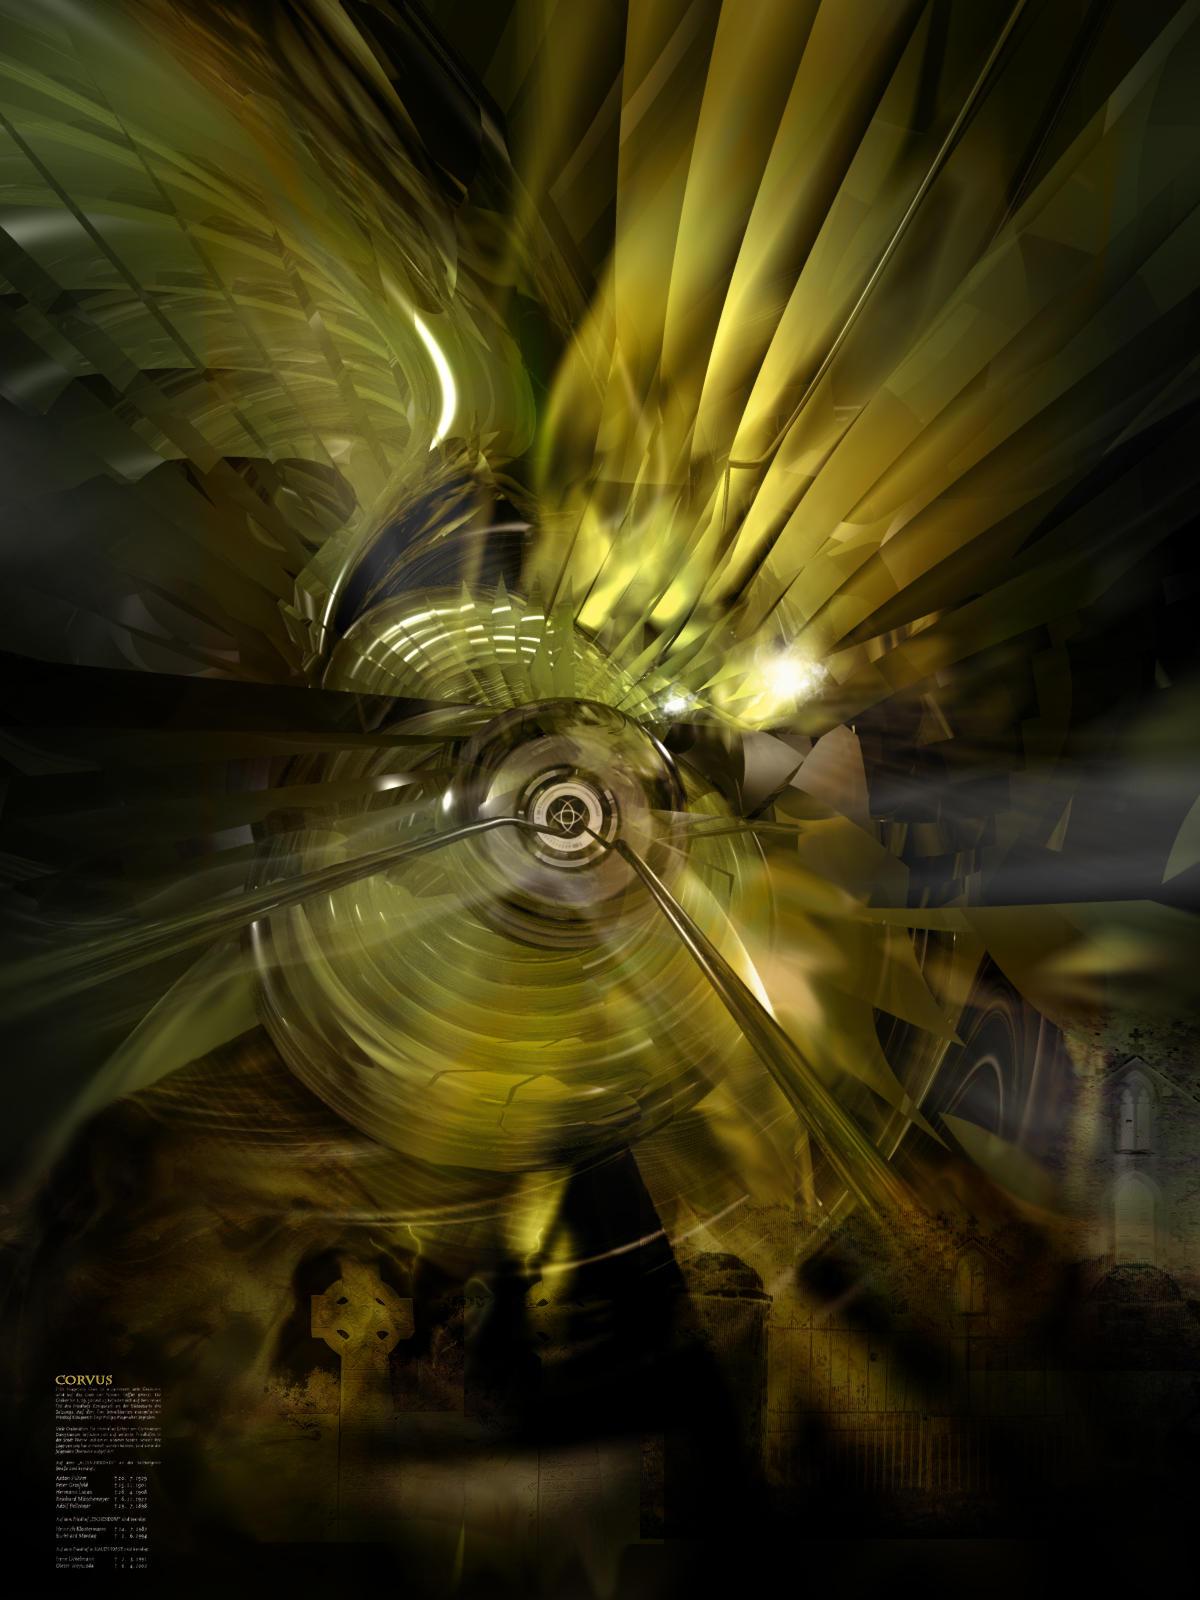 CORVUS by viperv6